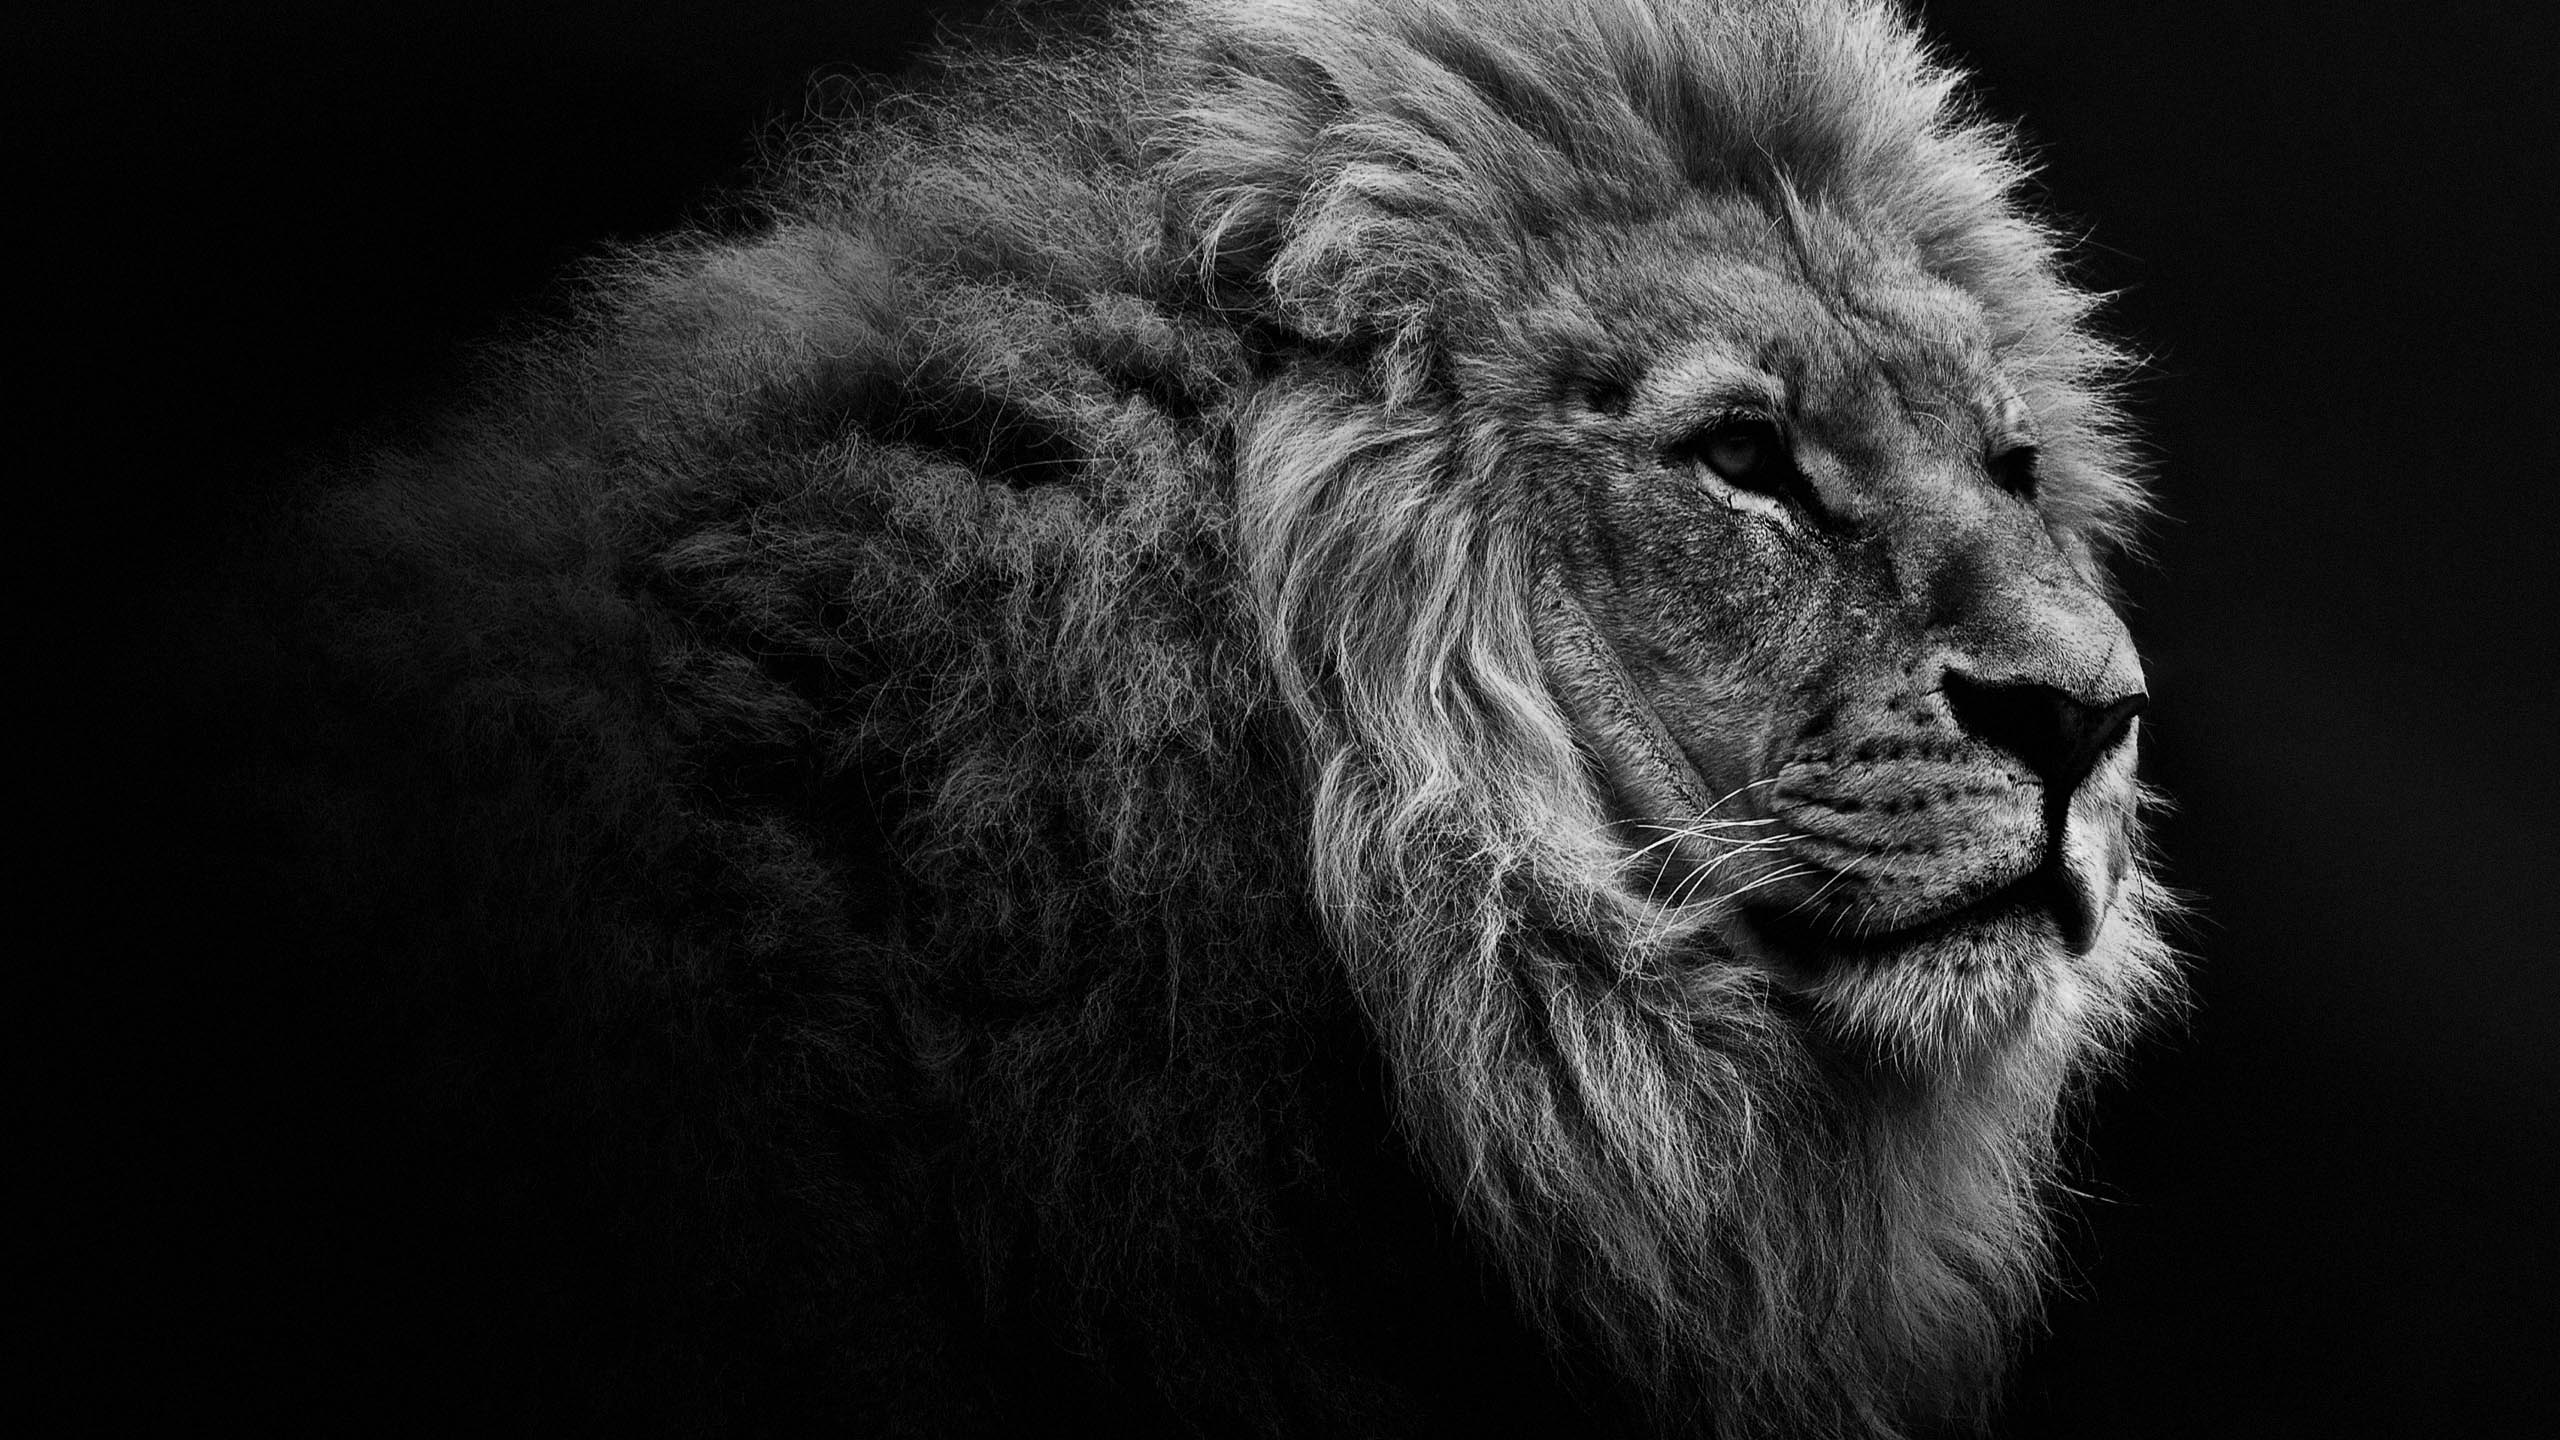 Lion Desktop Wallpaper Posted By Christopher Johnson